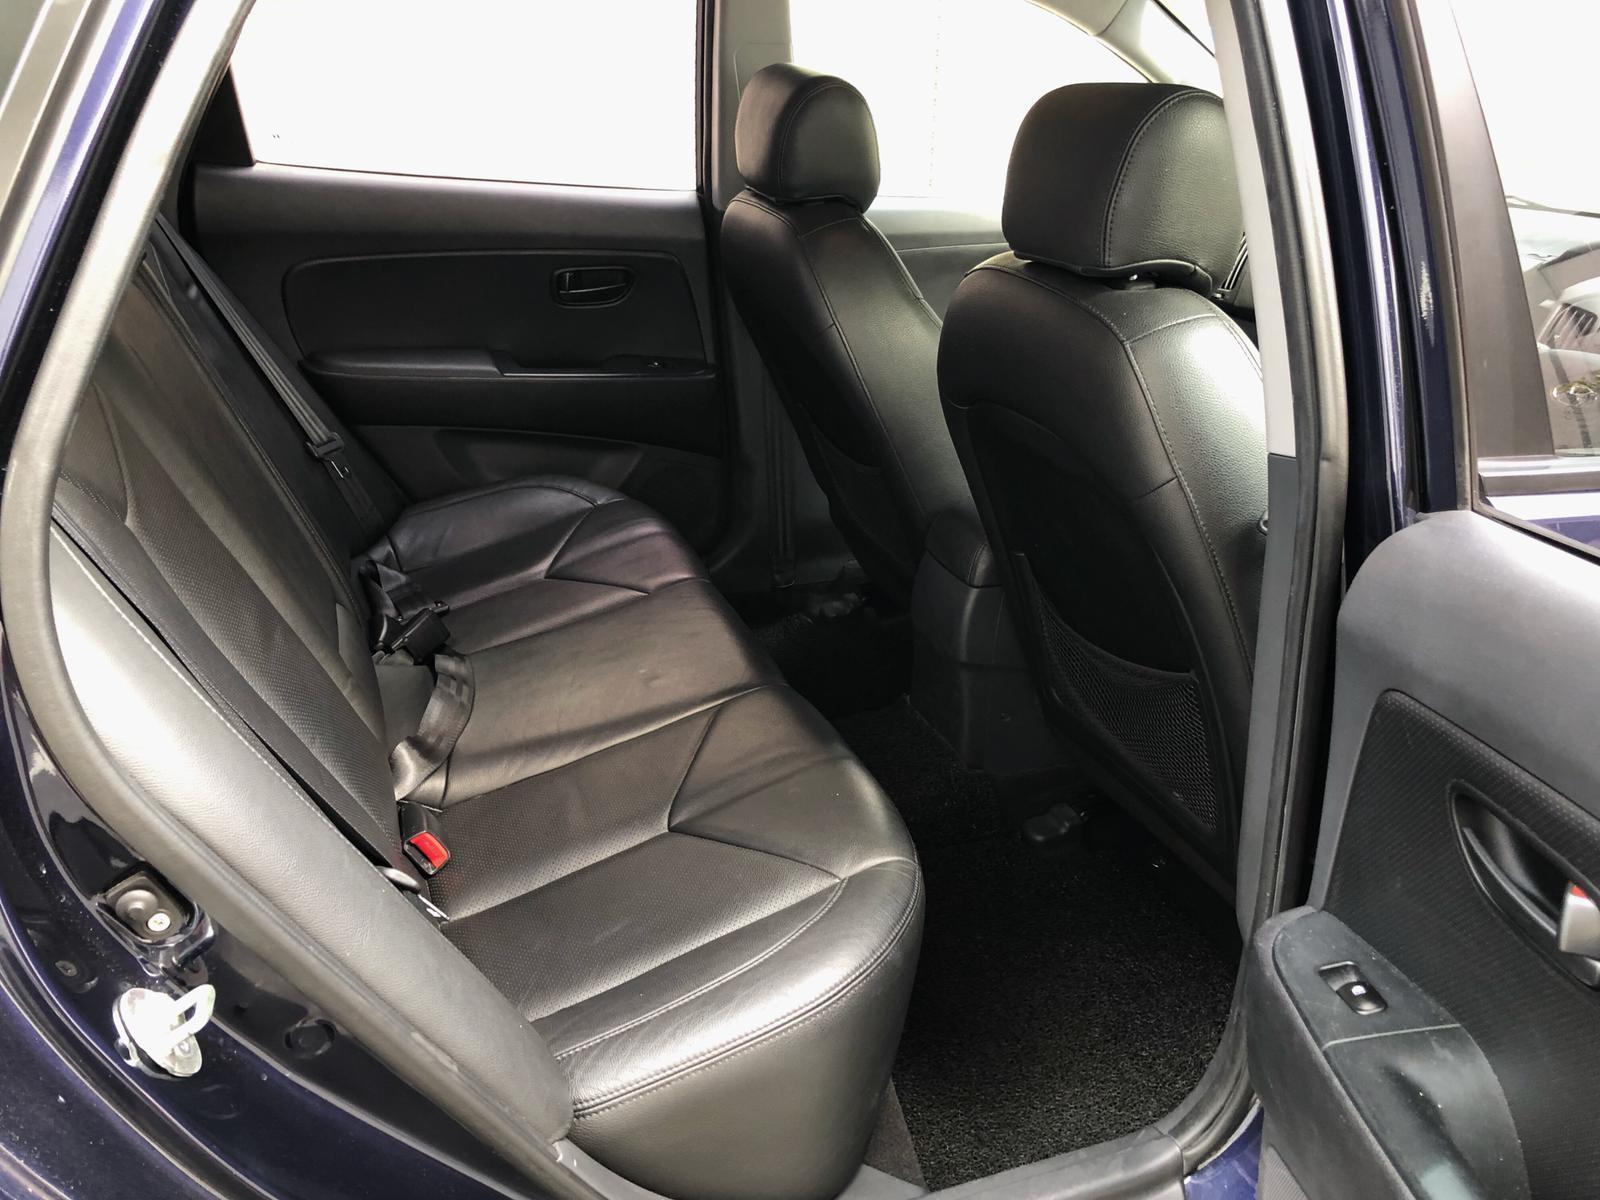 Hyundai Avante $47 Toyota Vios Wish Altis Car Axio Premio Allion Camry Estima Honda Jazz Fit Stream Civic Cars Hyundai Avante Mazda 3 2 For Rent Lease To Own Grab Rental Gojek Or Personal Use Low price and Cheap Cars